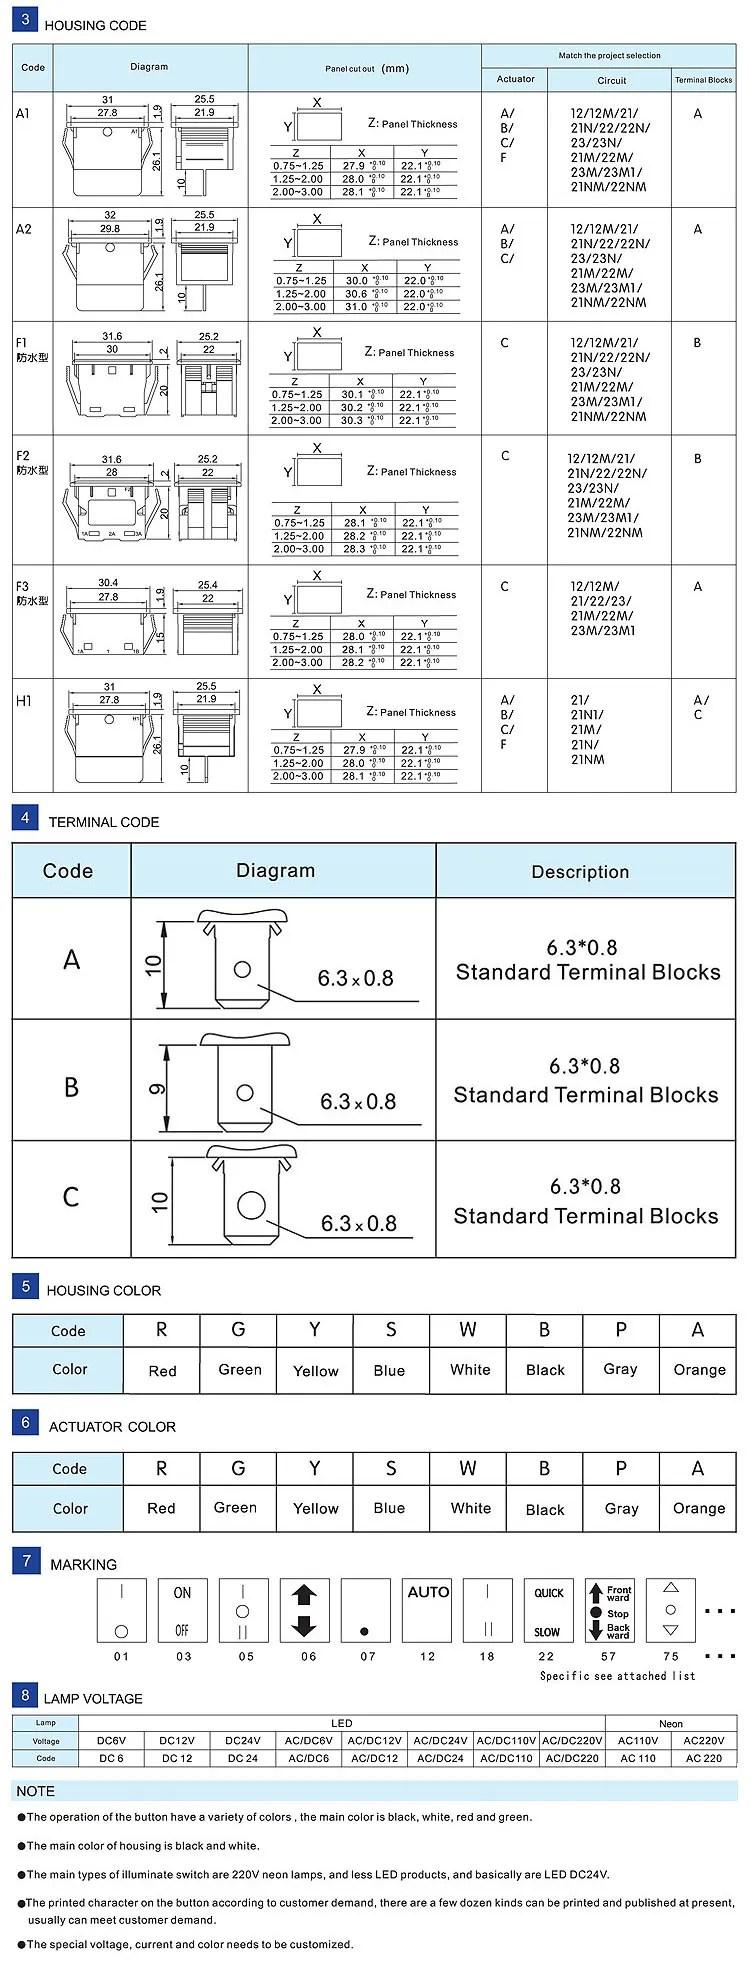 medium resolution of 16a 250vac t85 1e4 wiring diagram spst rocker switch